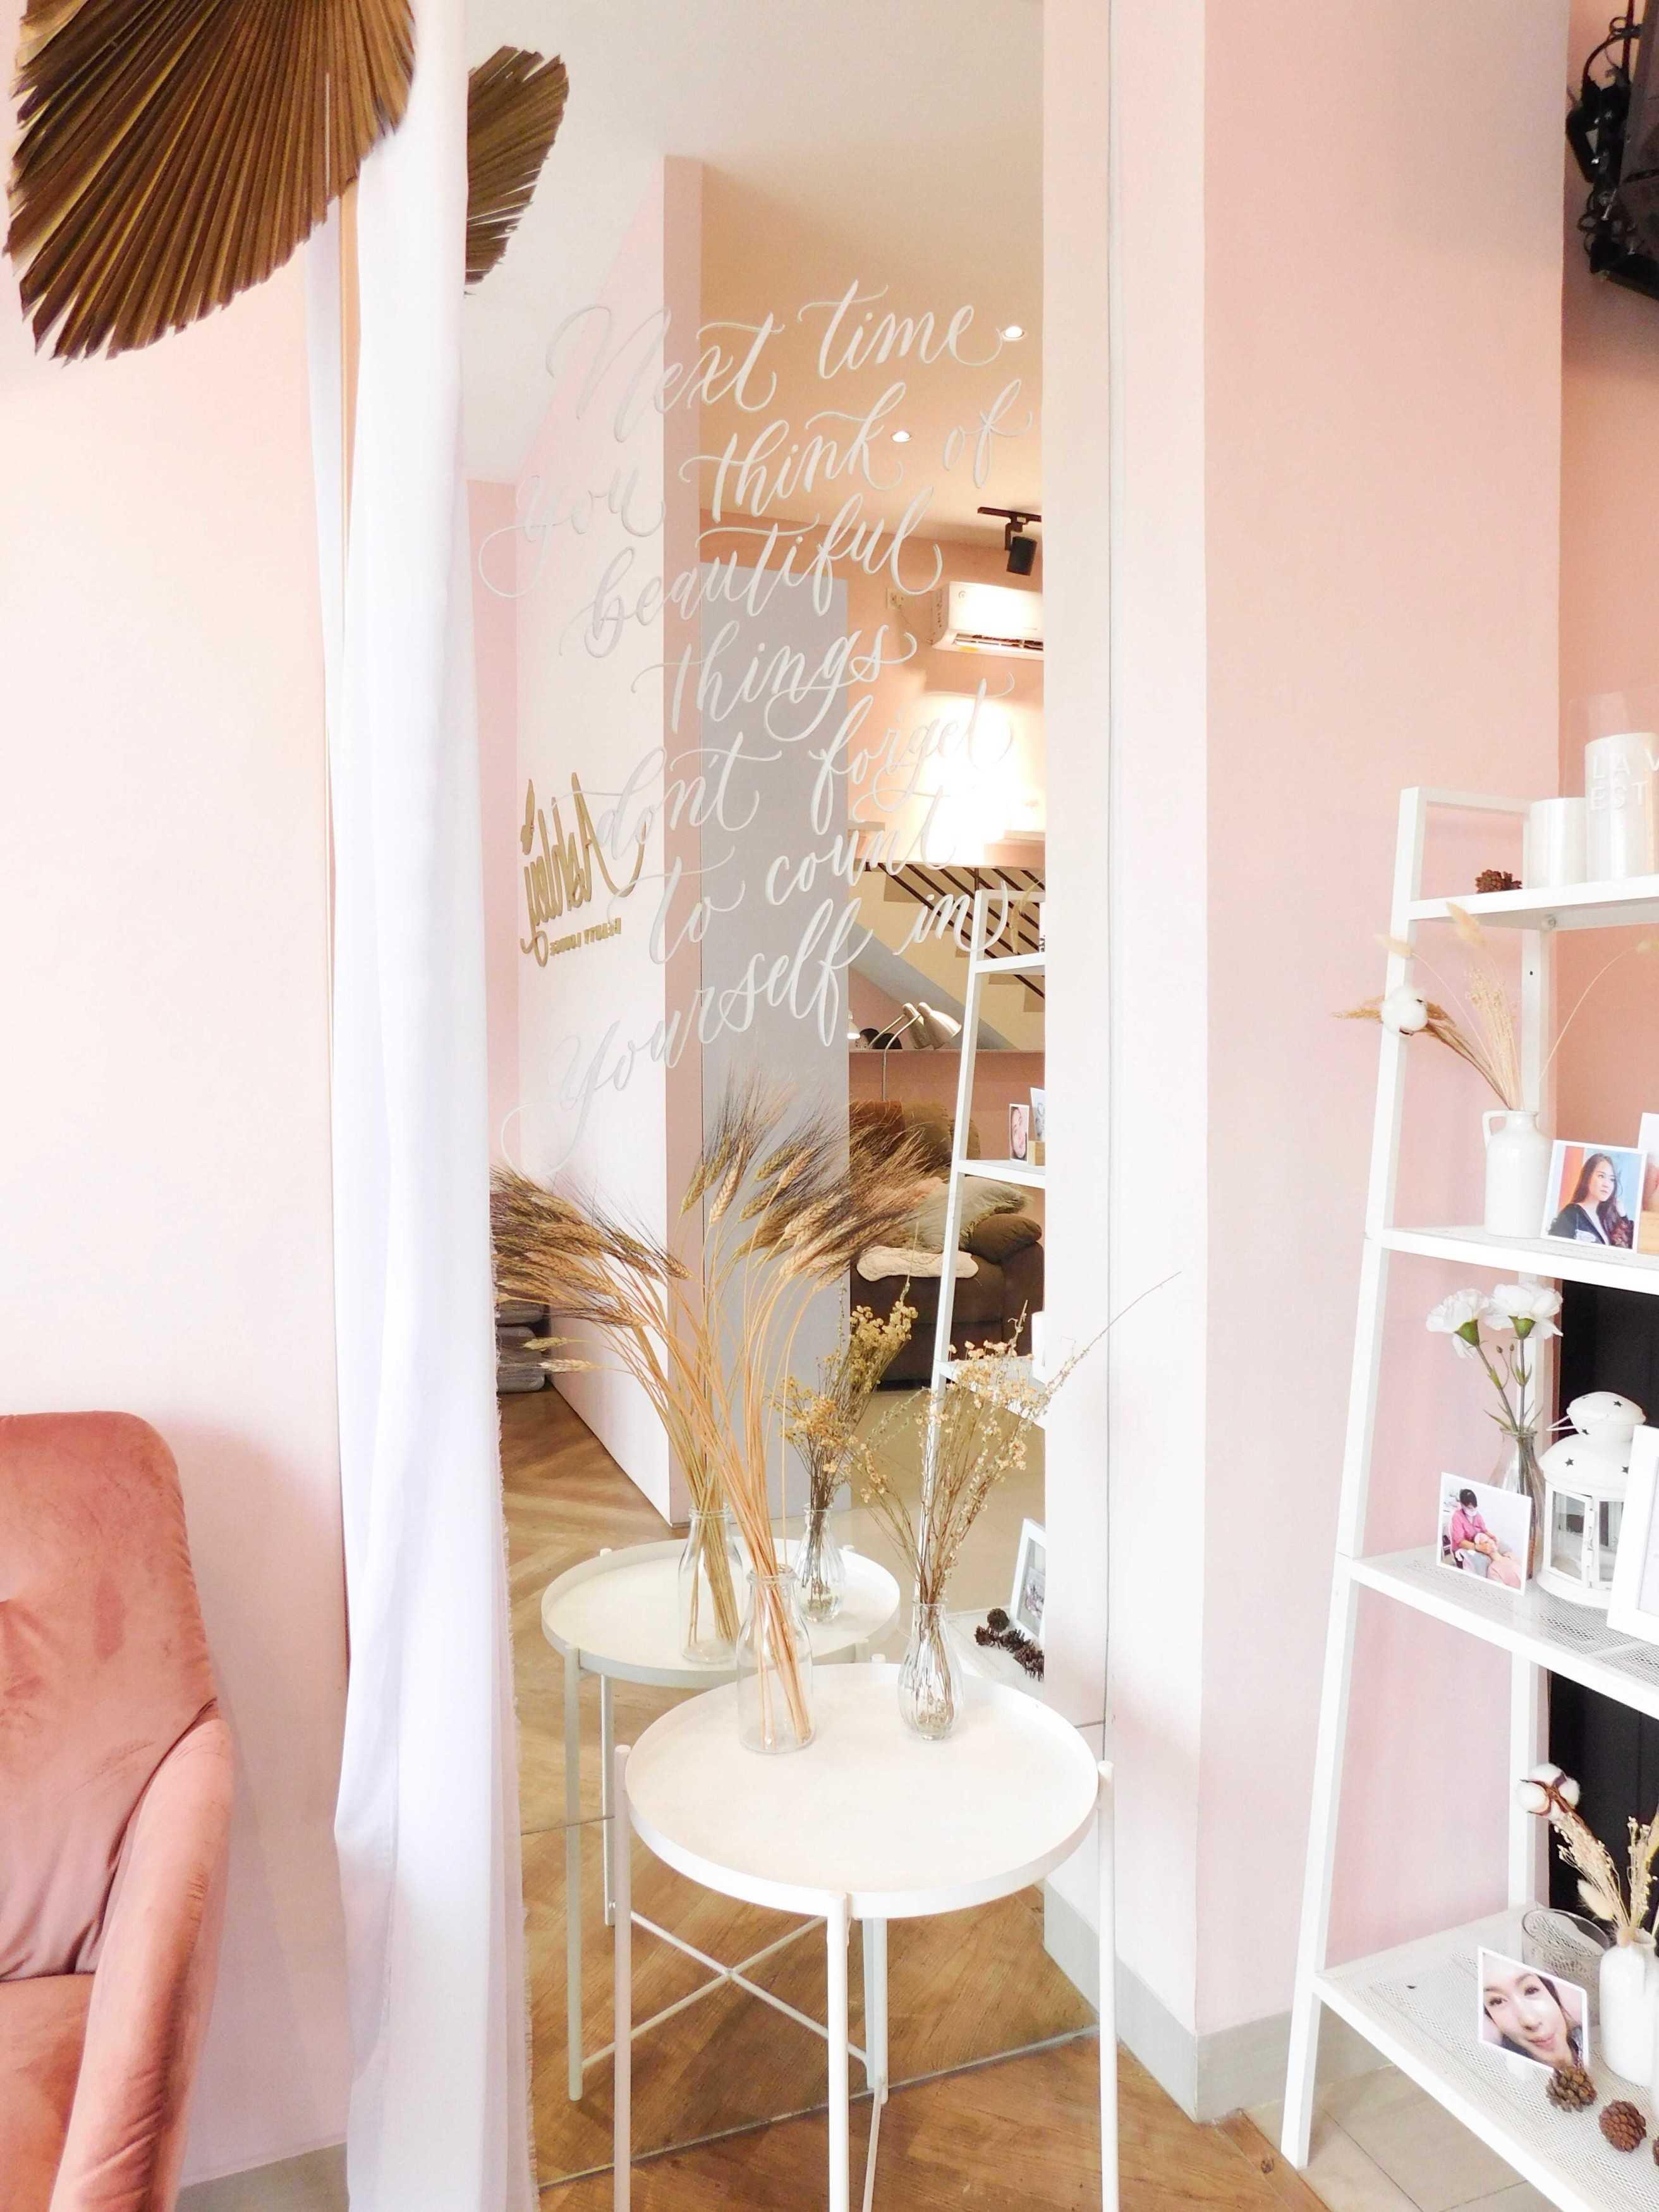 Jourell & Styles Beauty Salon Tangerang, Kota Tangerang, Banten, Indonesia Tangerang, Kota Tangerang, Banten, Indonesia Jourell-Styles-Beauty-Salon   134430